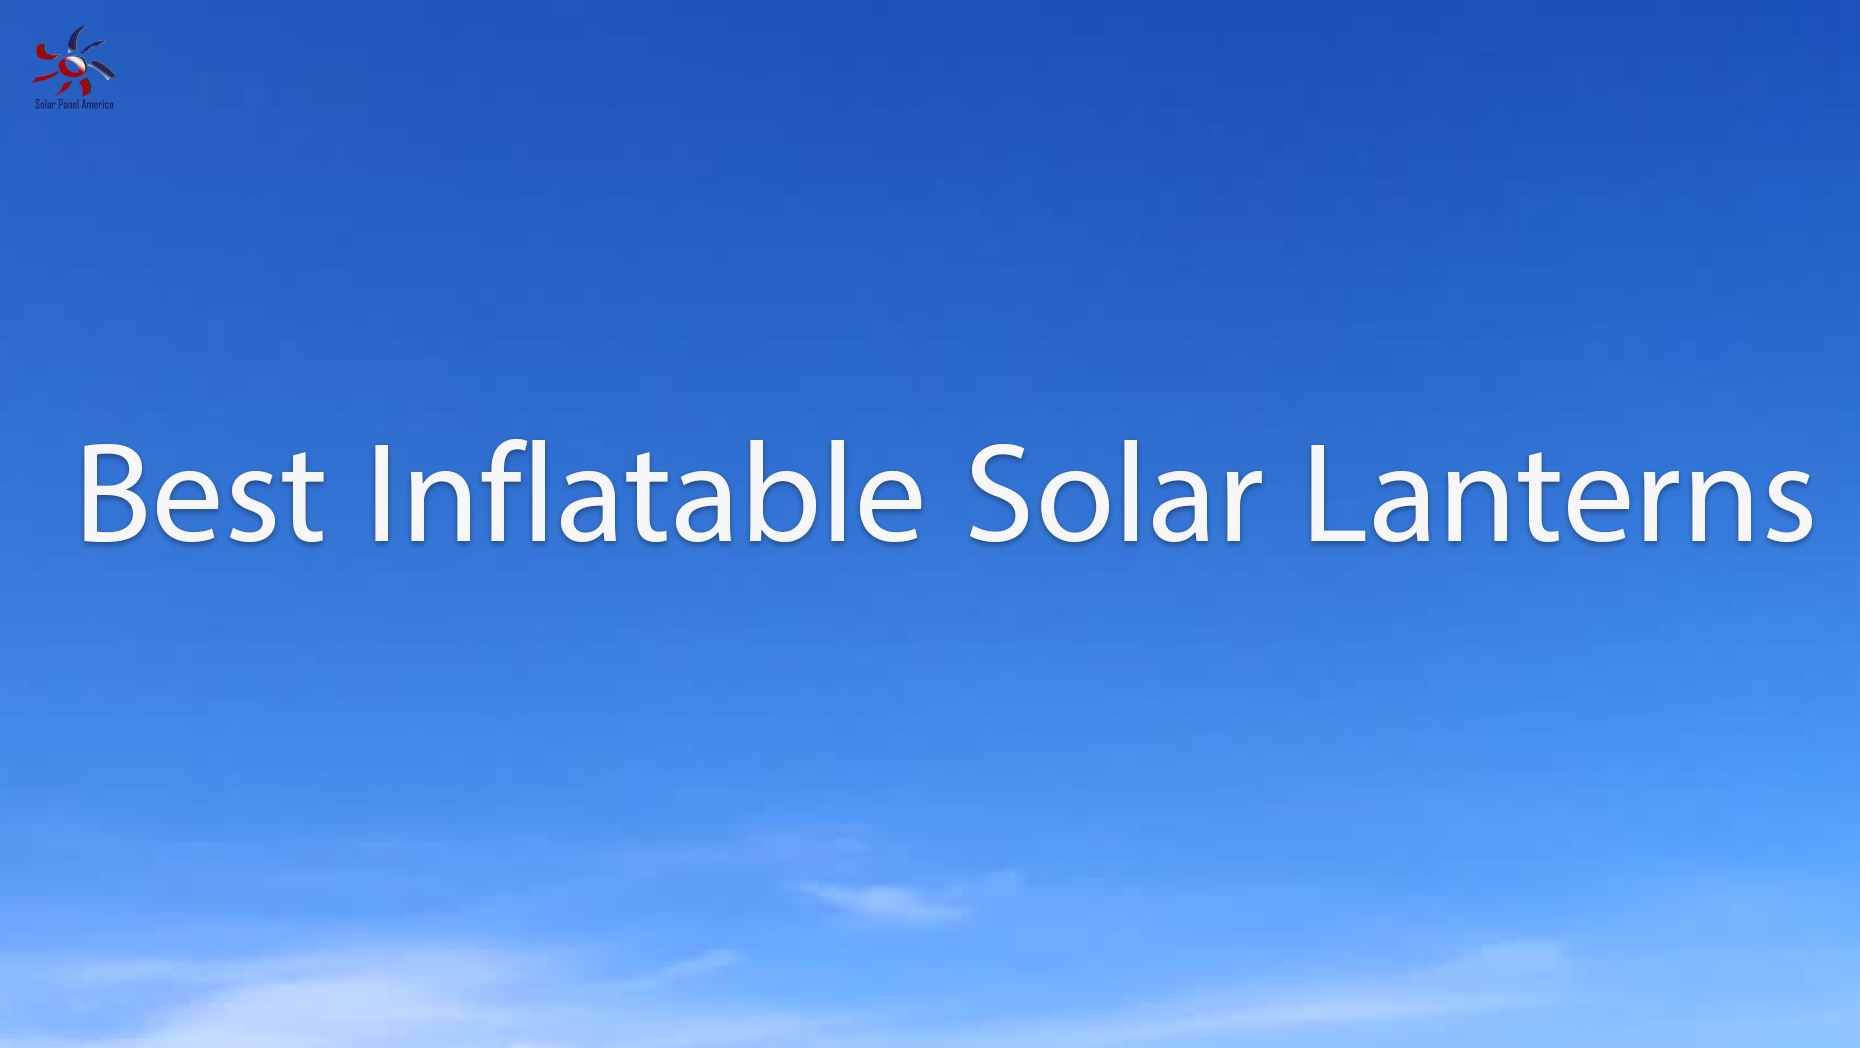 Best Inflatable Solar Lanterns 2020